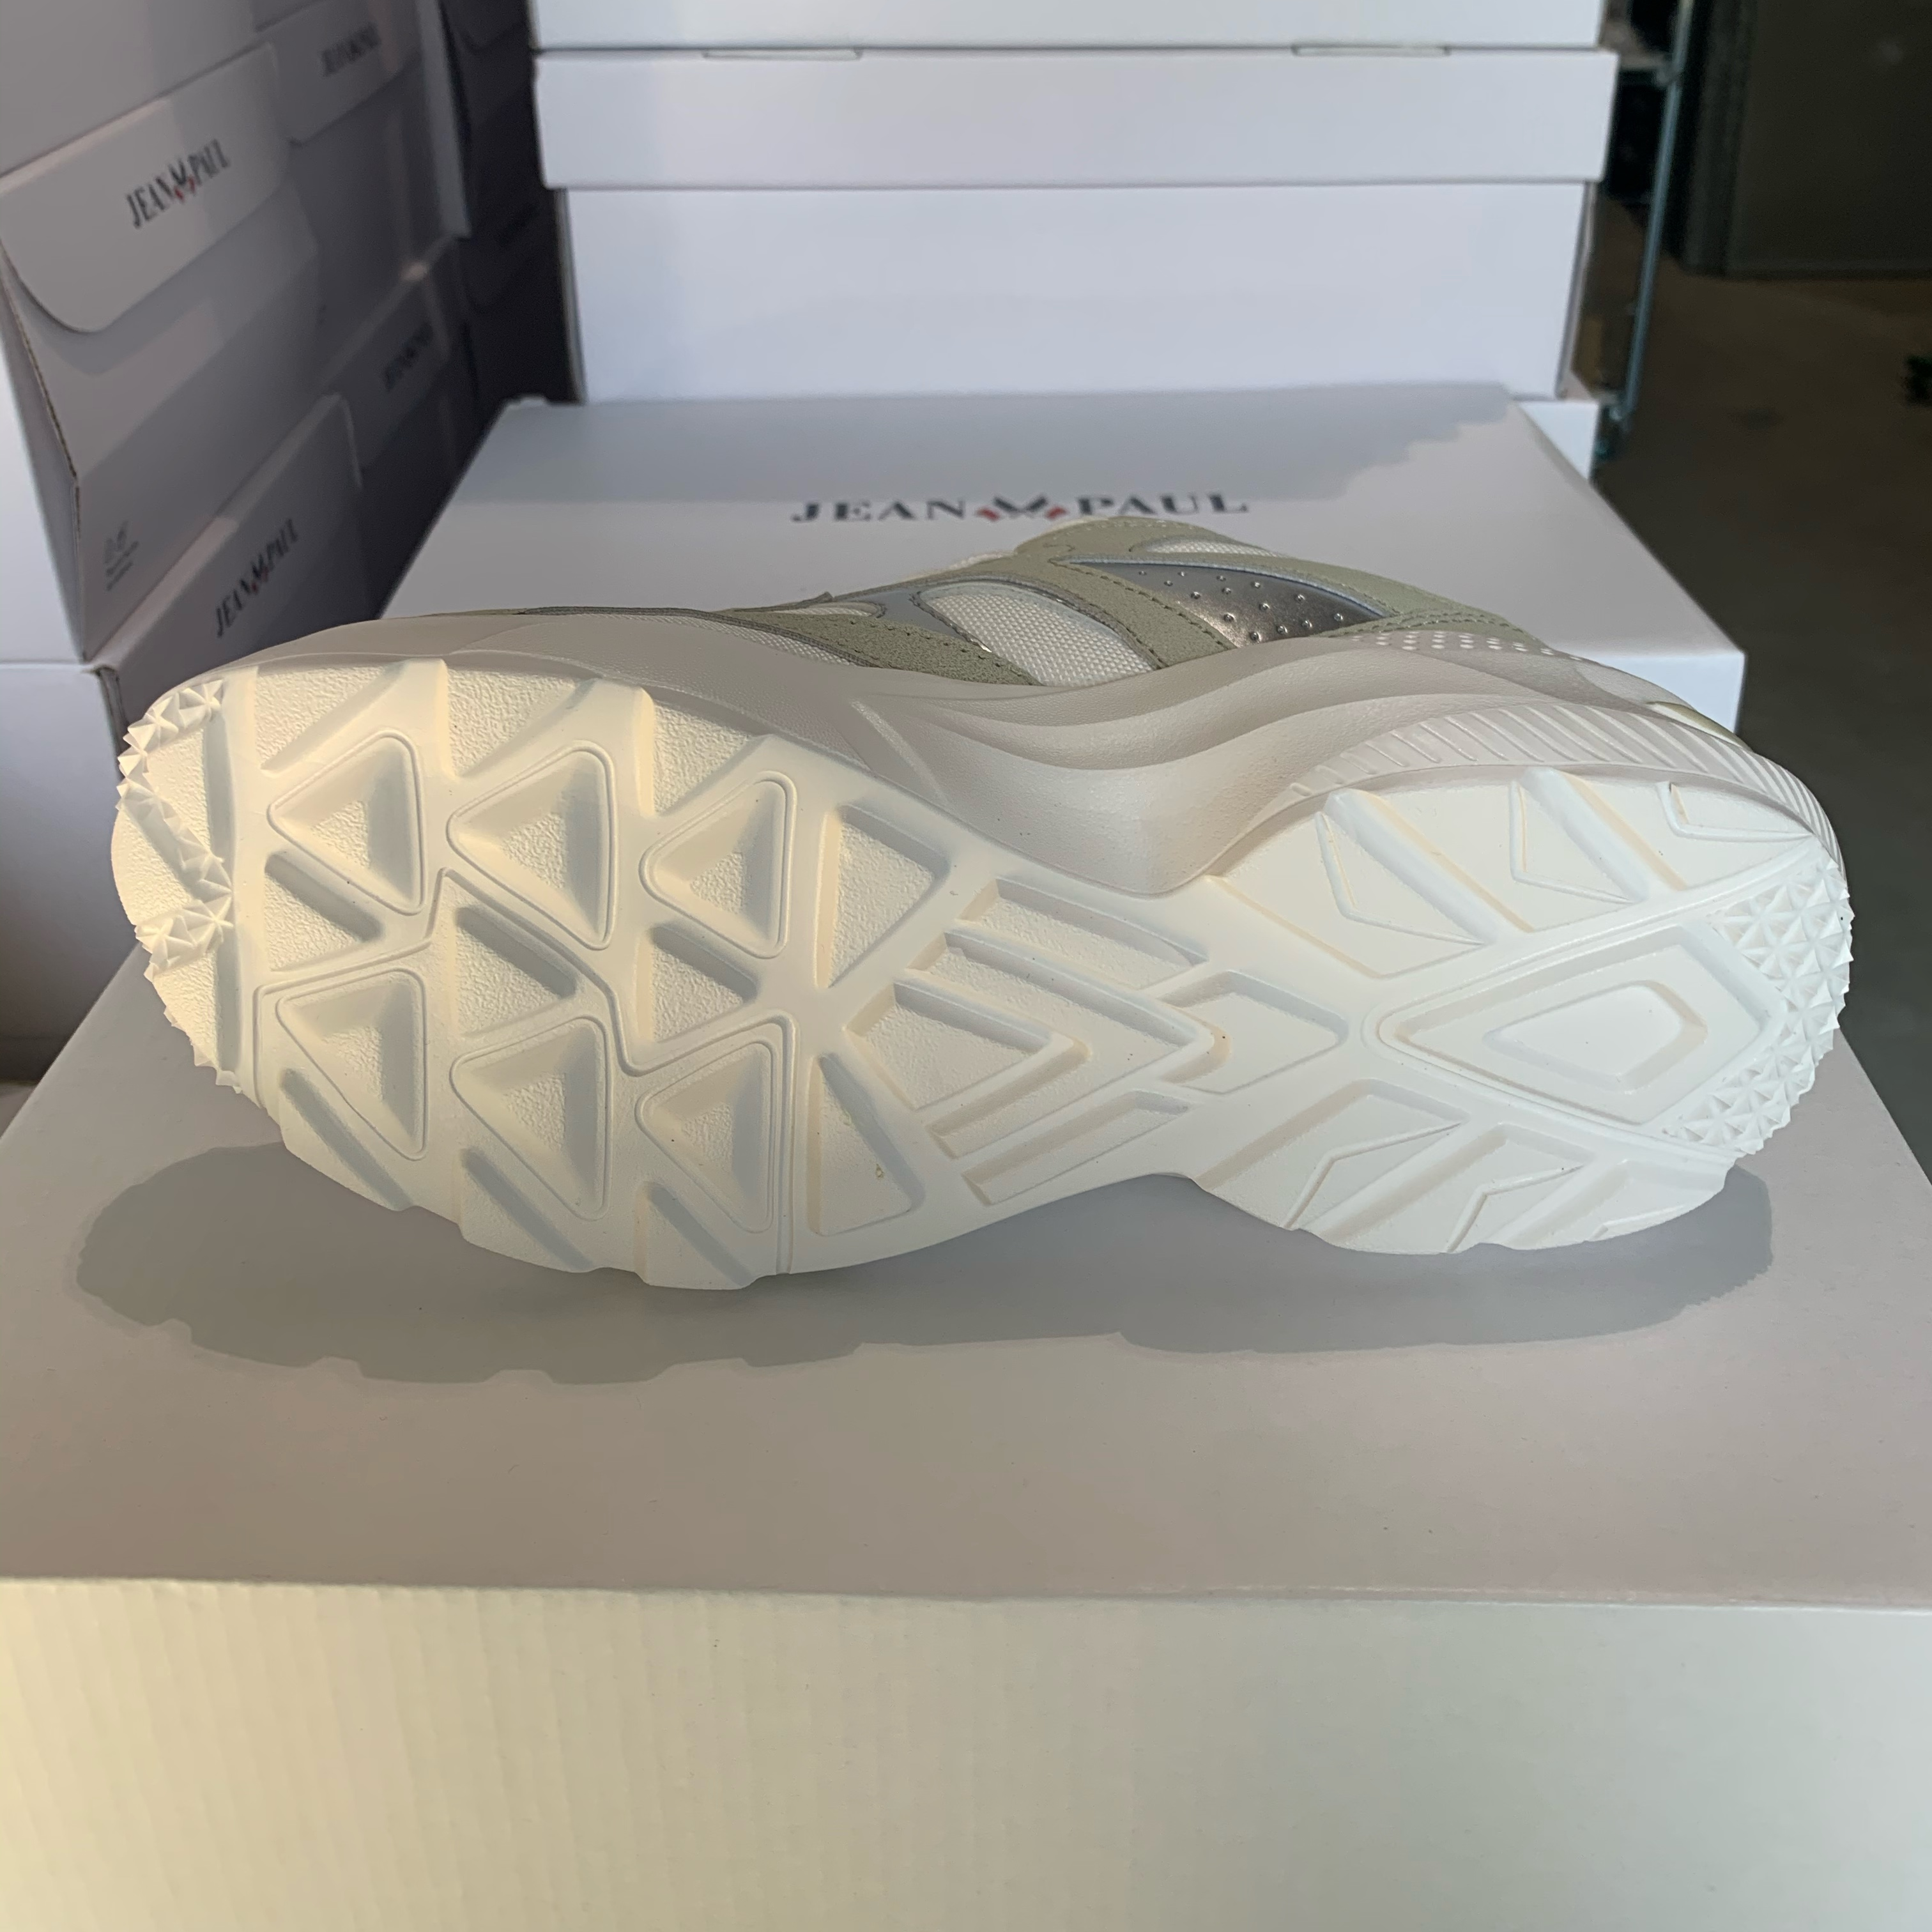 jean paul aix chunky sneakers white beige4